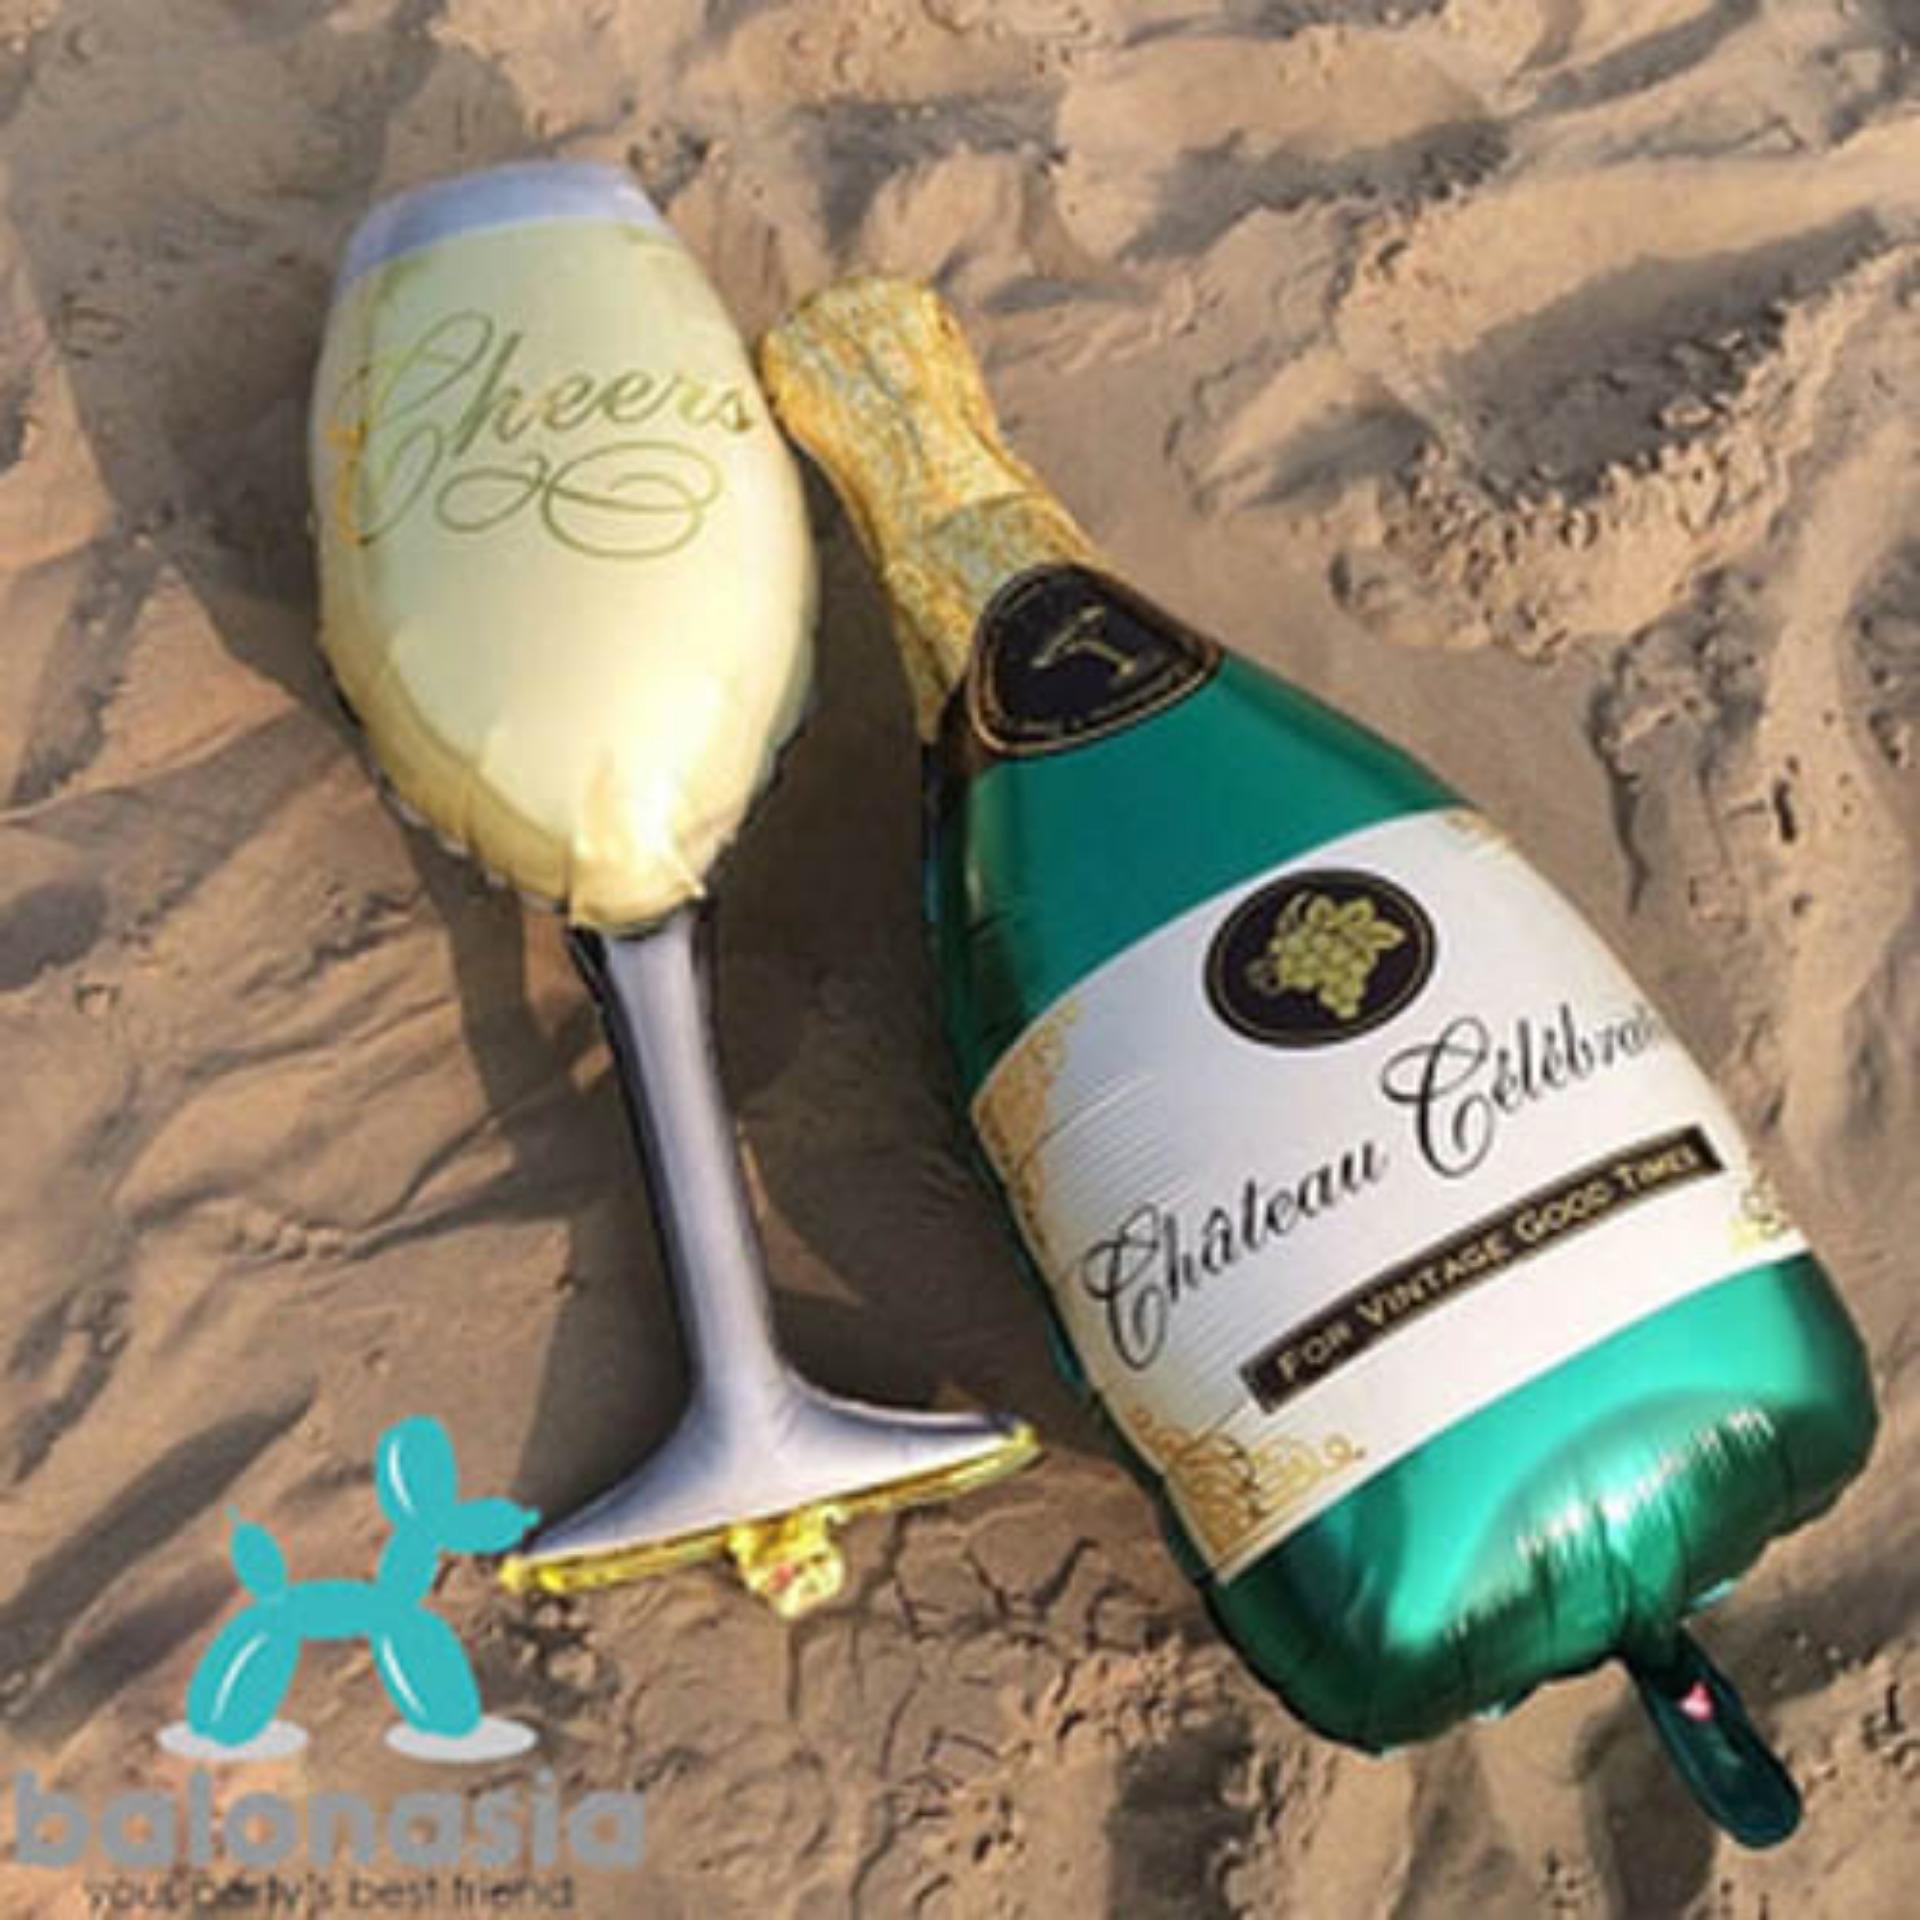 Balonasia Balon Foil Champagne Piala Cheer Perayaan Helium Dekorasi Backdrop Tirai Dekorasipernikahan Pesta Ulang Tahun